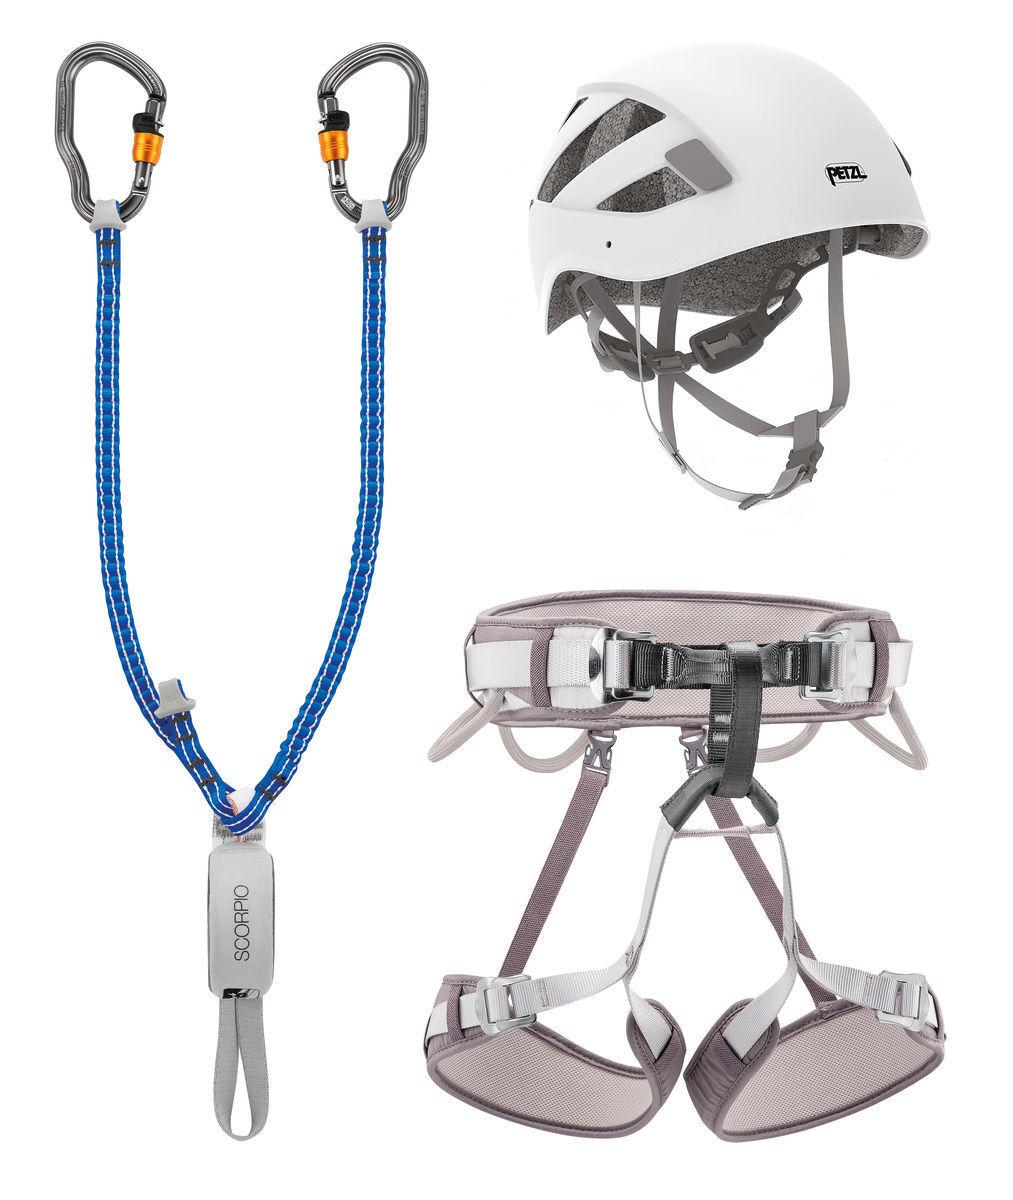 Harness harness Helmet Lanyard PETZL KIT VIA  FERRATA greenIGO CORAX  incredible discounts